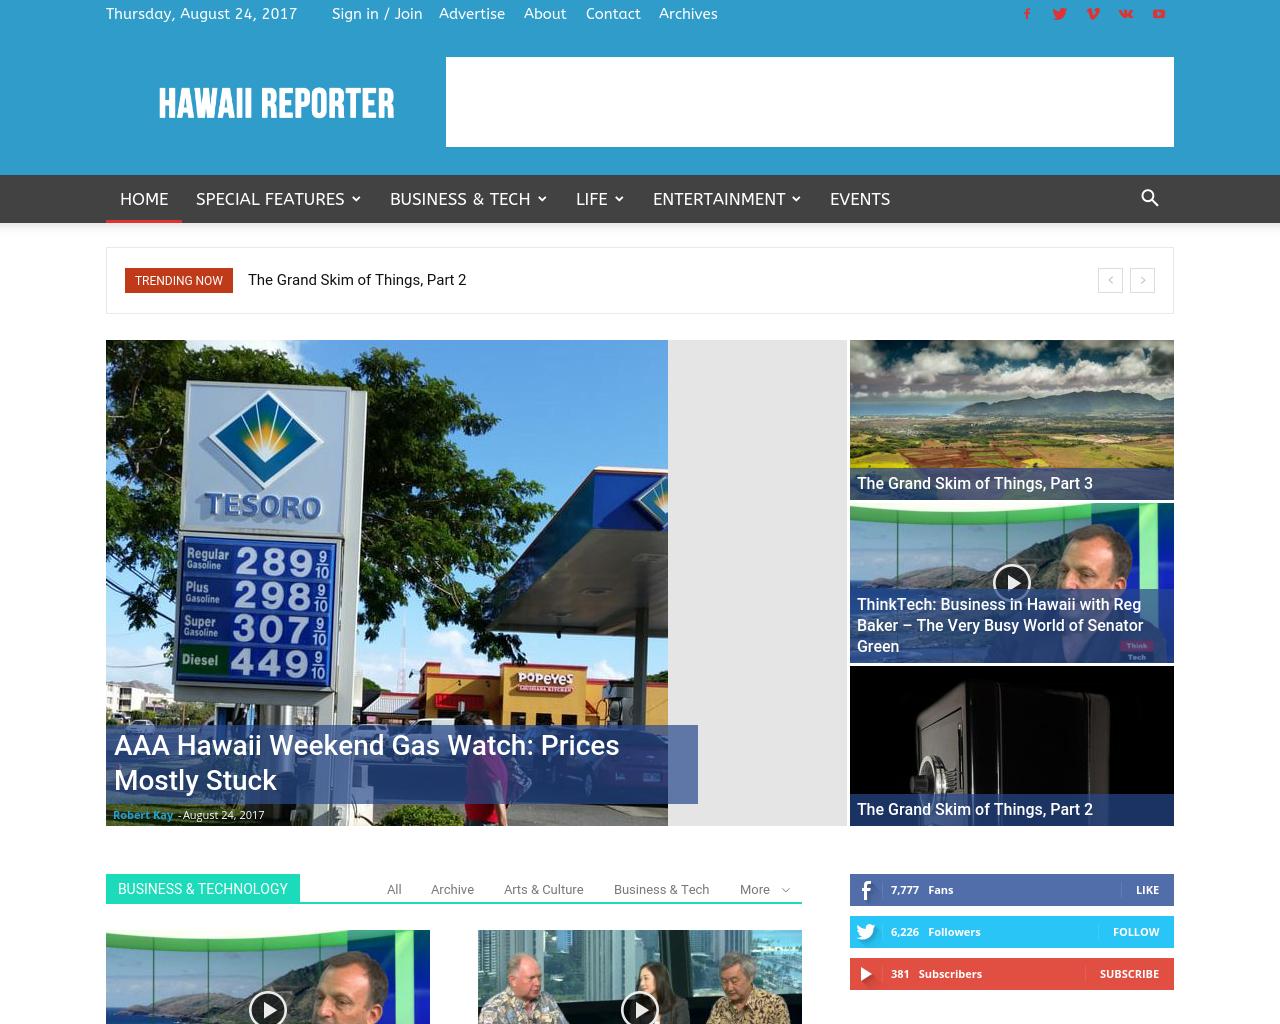 Hawaii-Reporter-Advertising-Reviews-Pricing